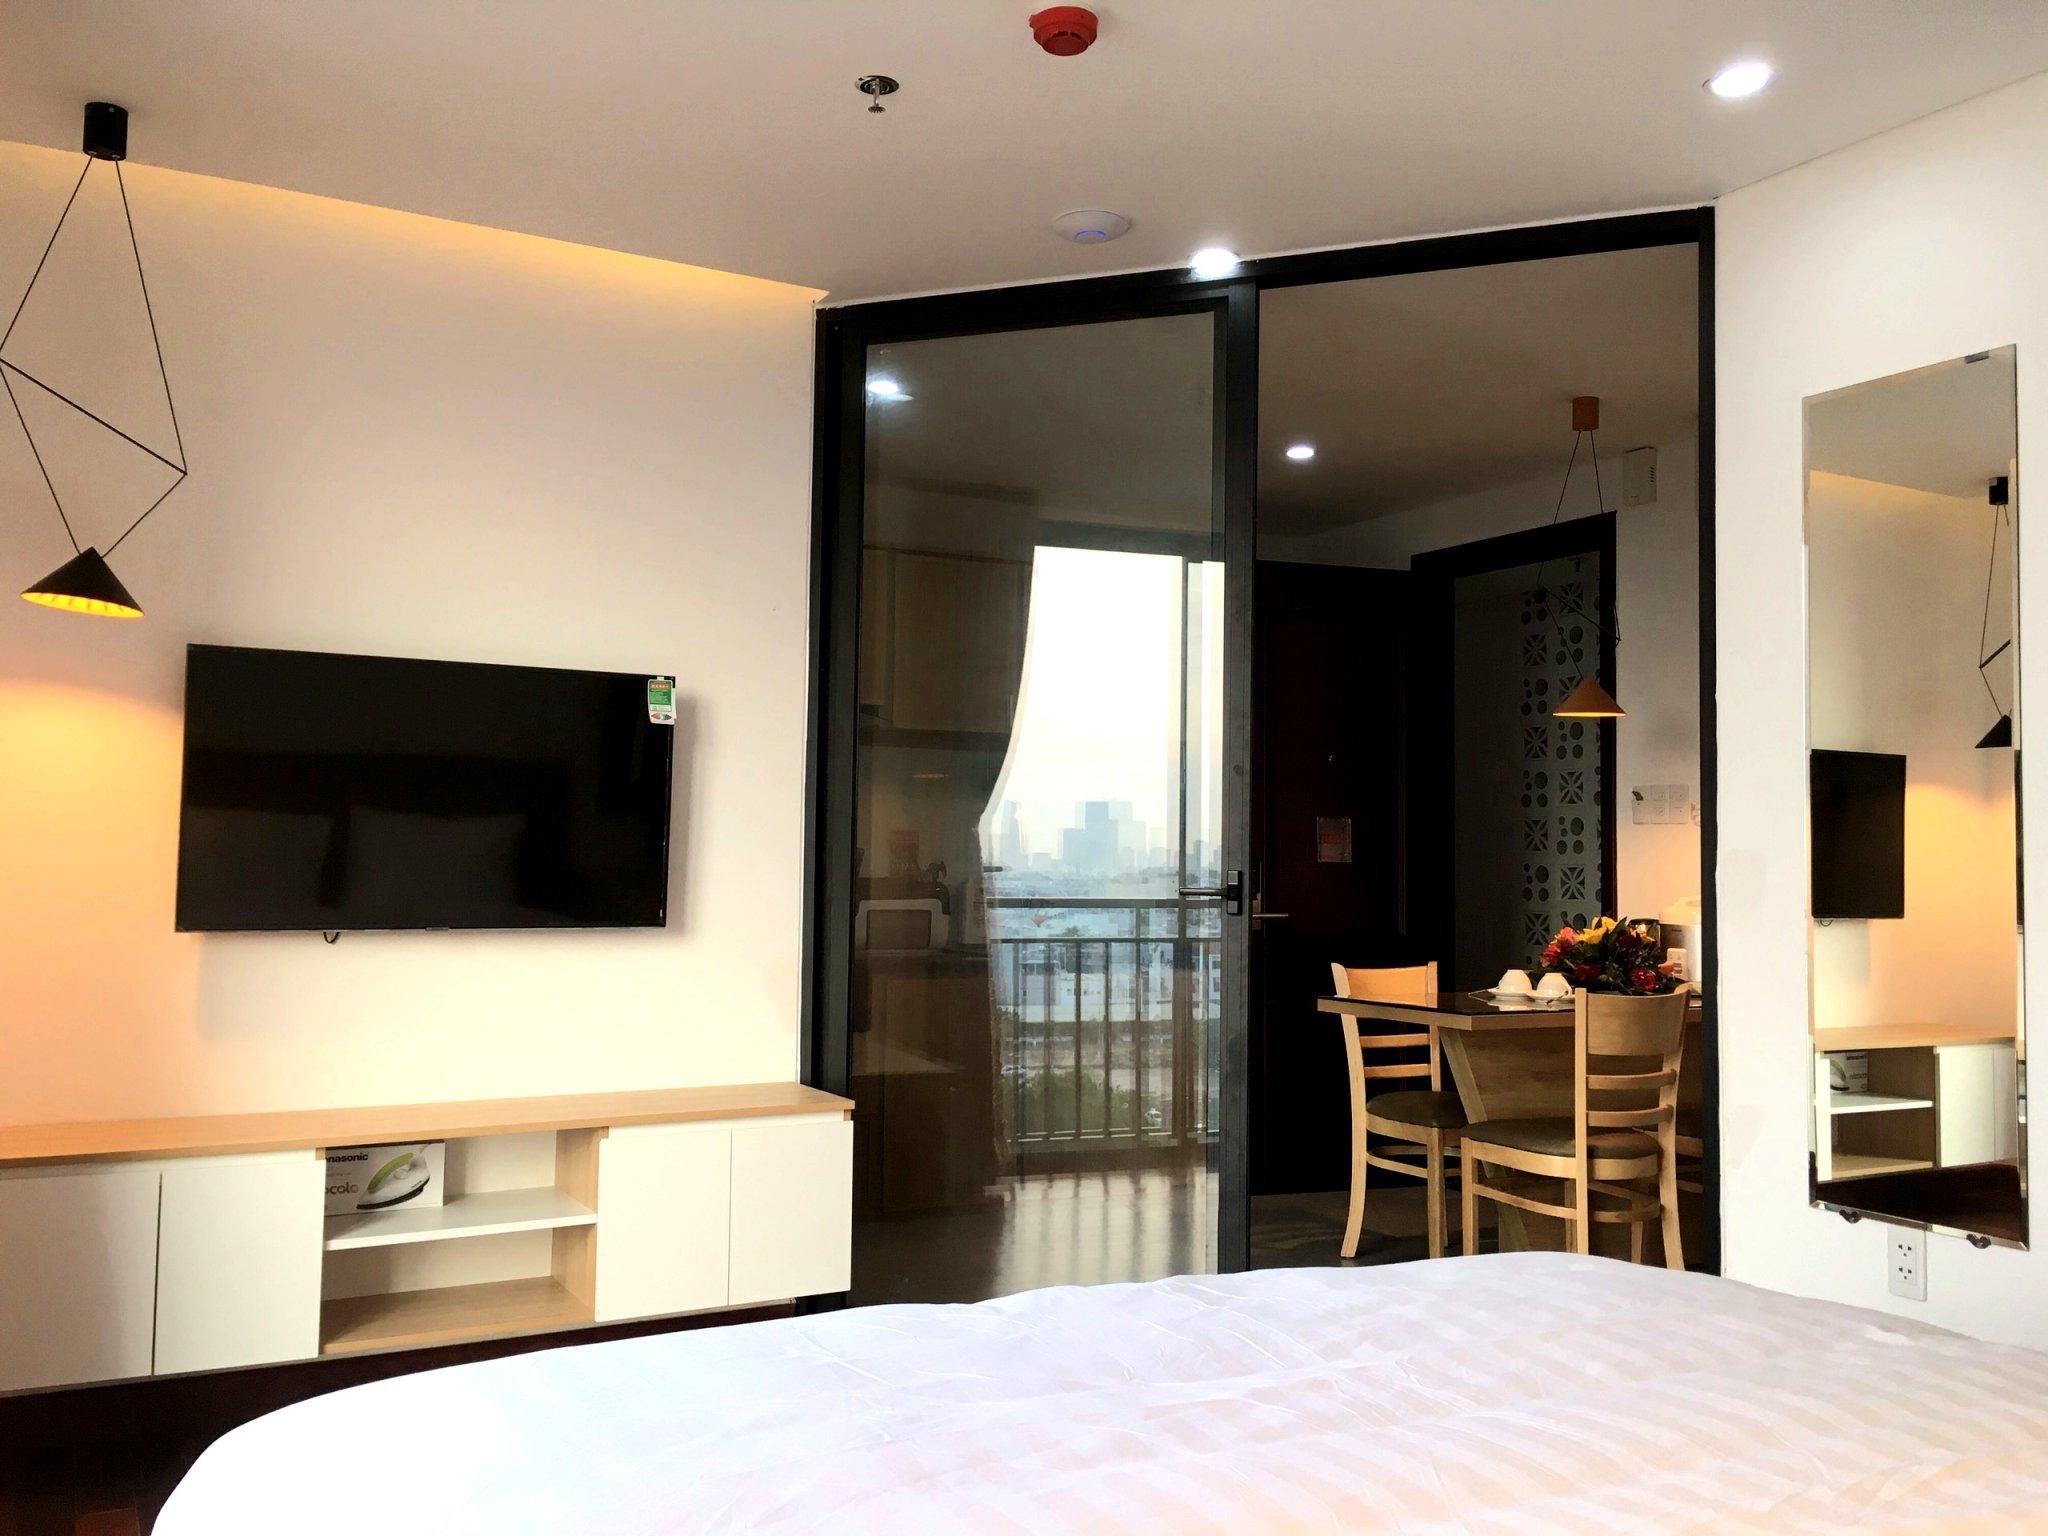 1 Bedroom Apartment in expat area